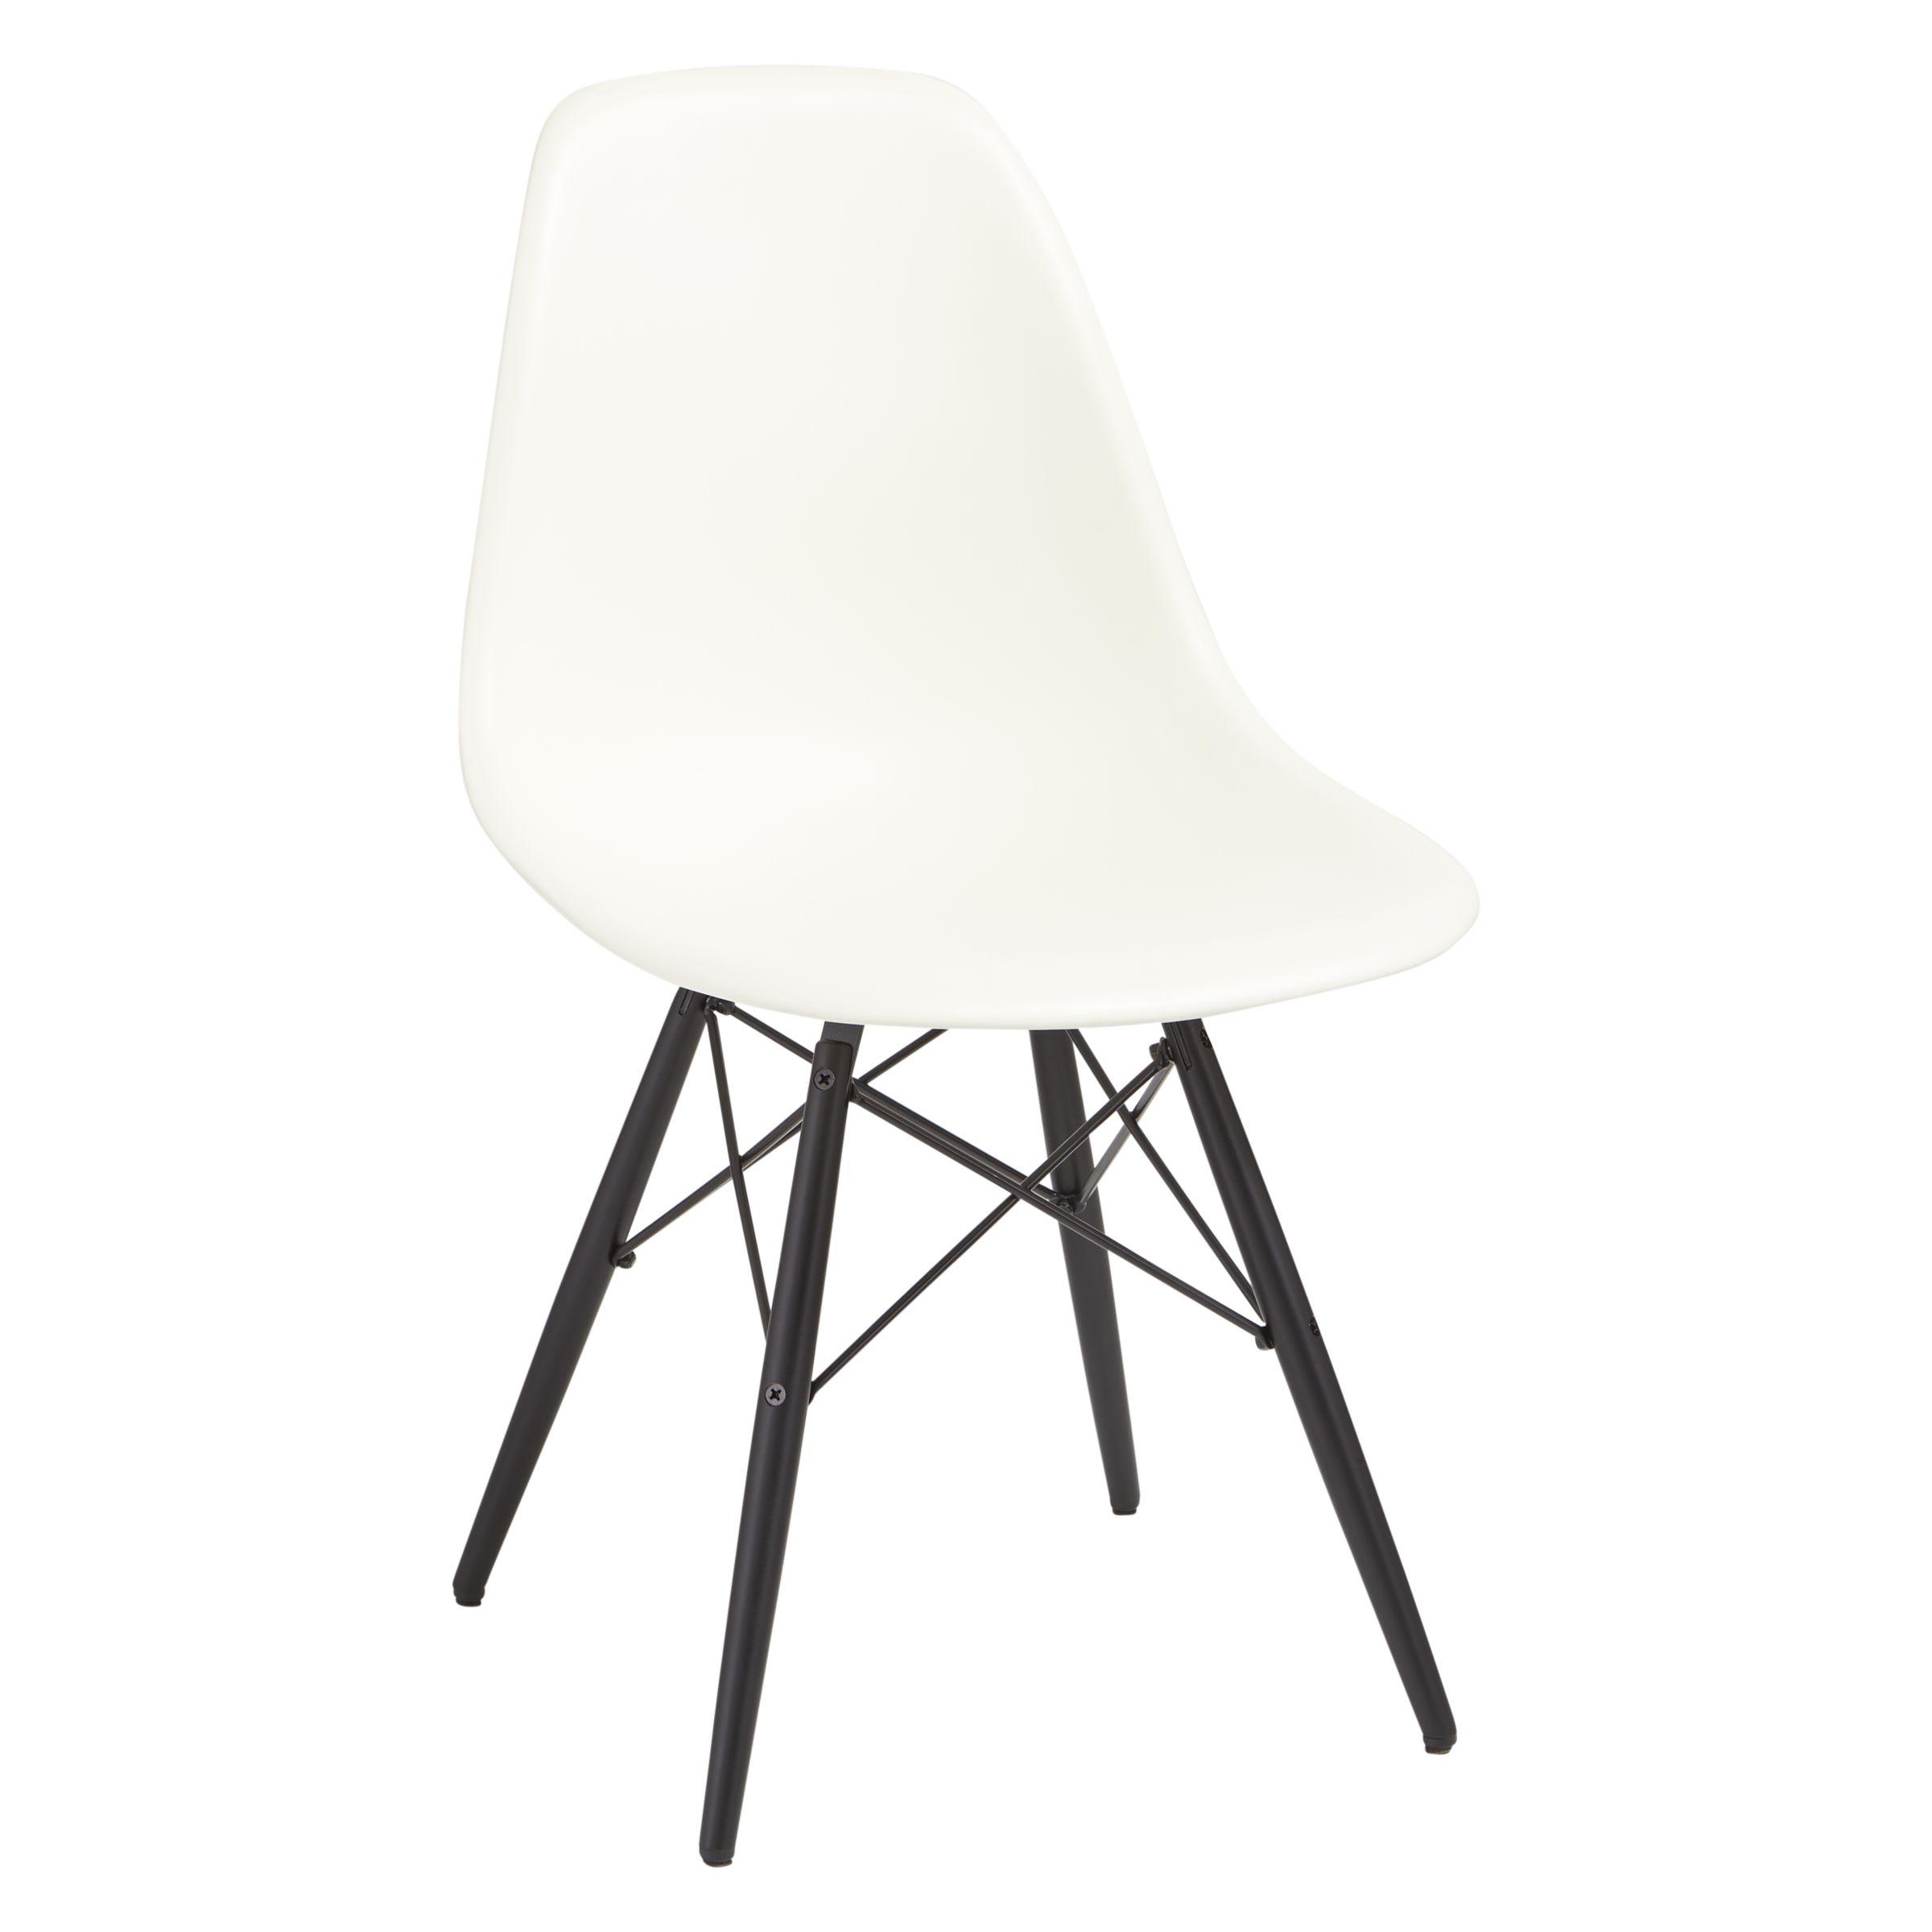 black eames chair cb2 leather vitra dsw side maple leg at john lewis partners buyvitra cream online johnlewis com